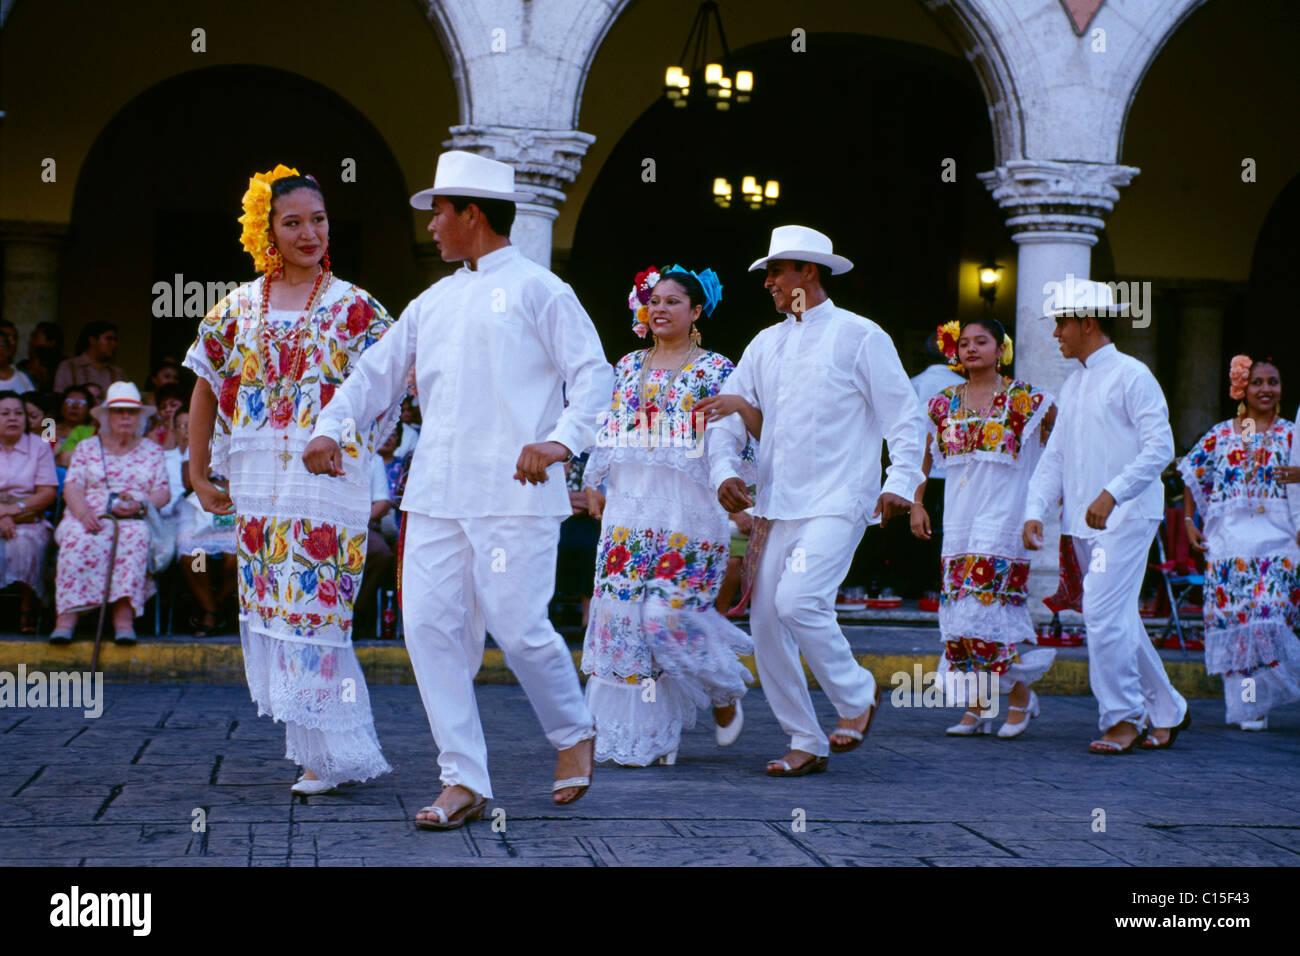 Vaqueria traditional dance, Merida, Yucatan, Mexico - Stock Image